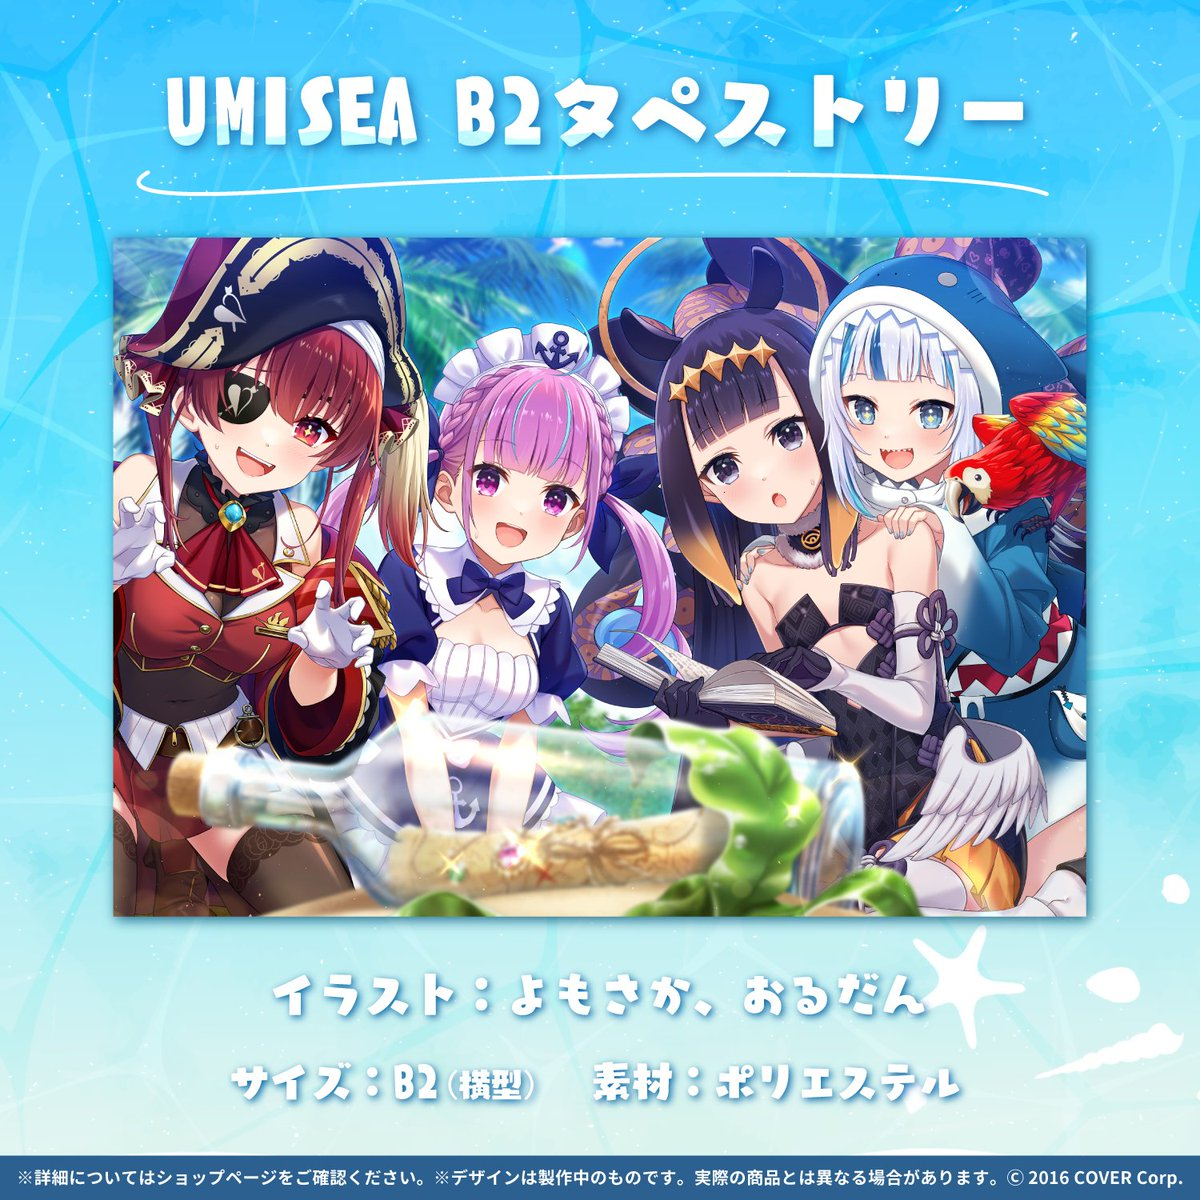 "UMISEAグッズ情報が出ましたね〜🥳🌊#UMISEA""UMISEA"" to Release Official Merchandise Today!B2タペストリー&アクキーどちらも4人らしさが出ていると思います✨19:00 JST販売開始‼[JP][EN]"